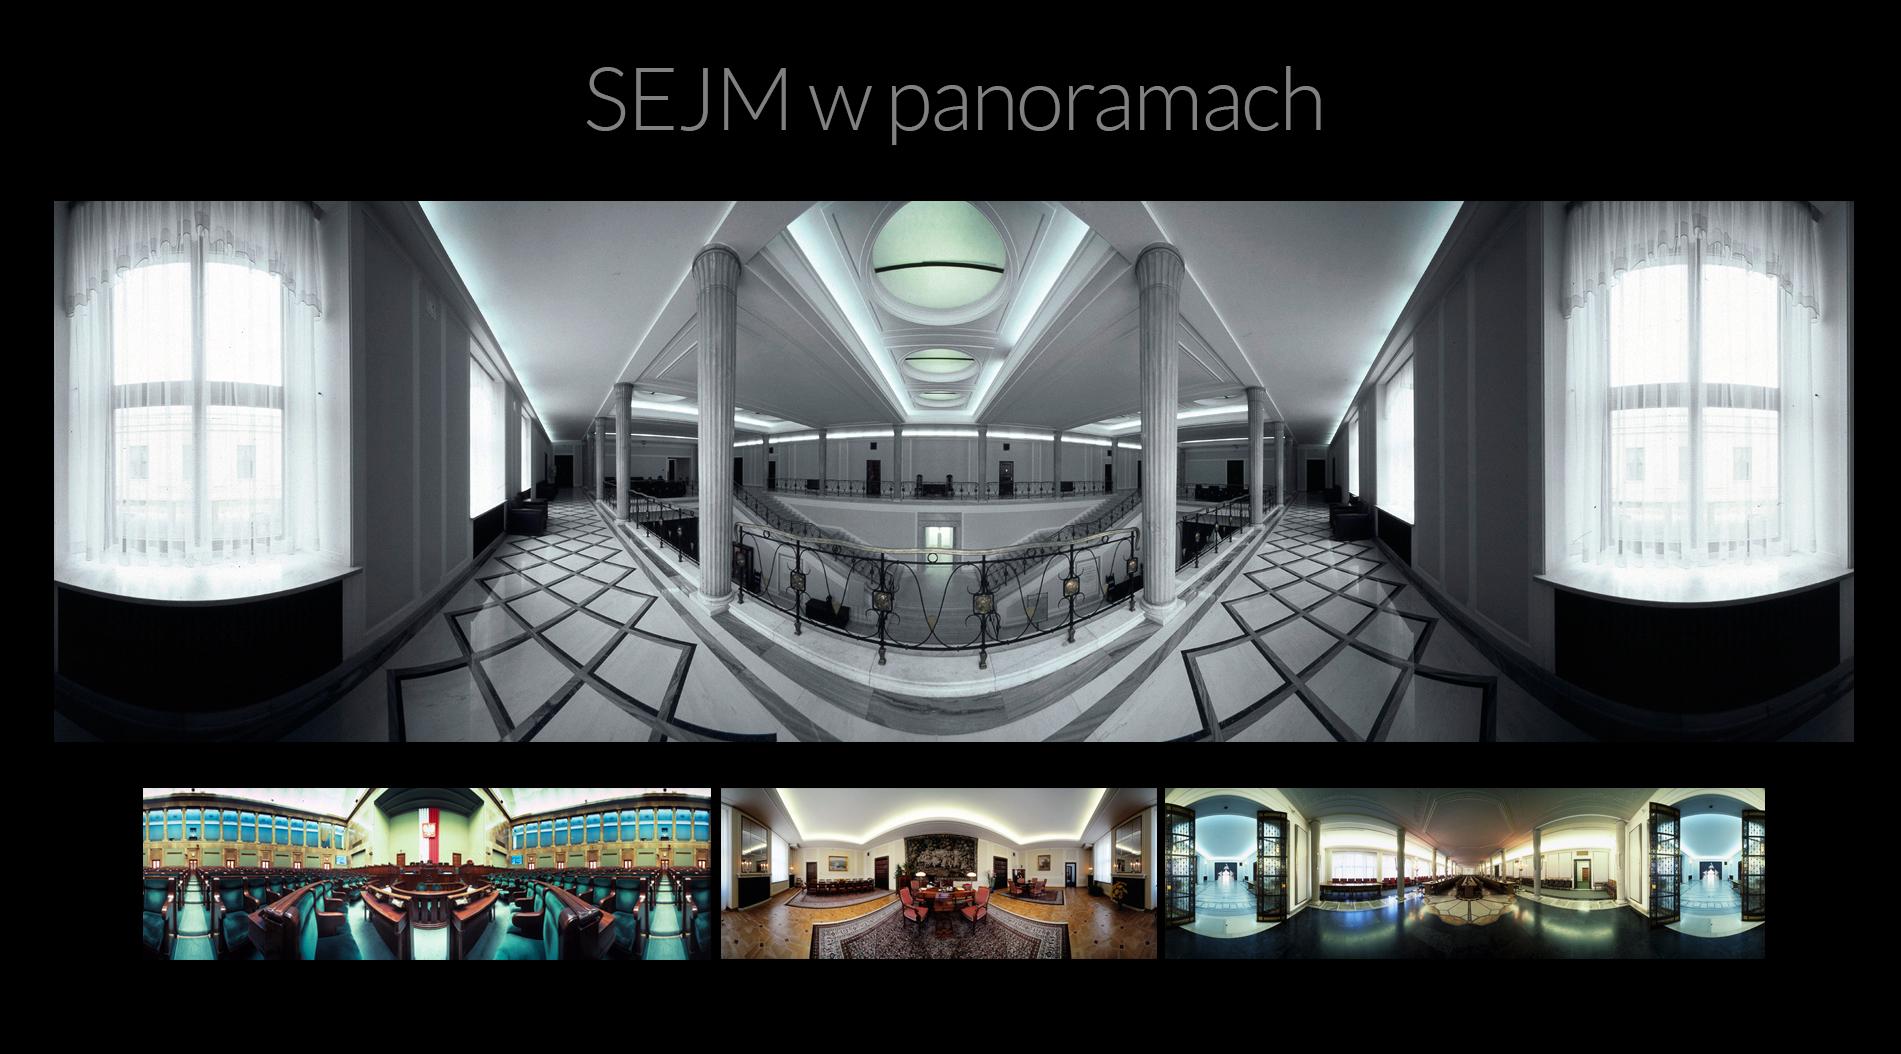 Sejm w panoramach